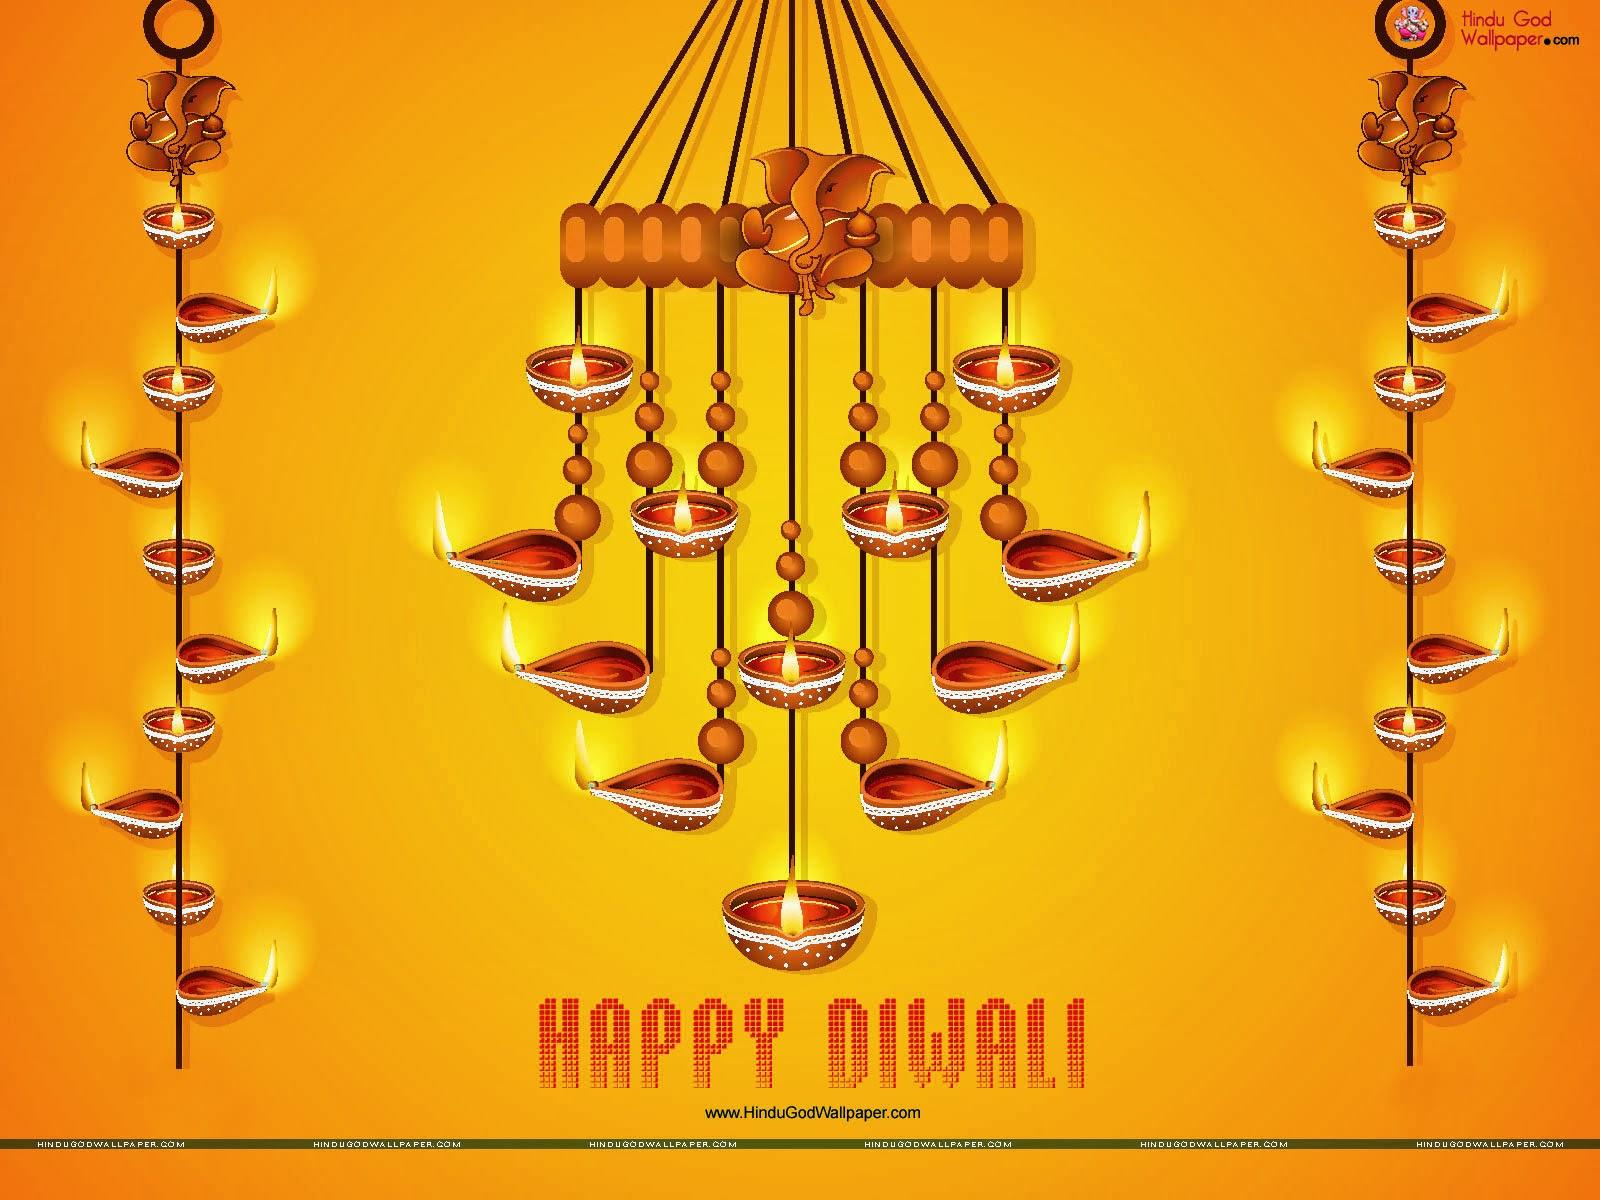 Lord Ganesha Animated Wallpapers Diwali Diya Hindu God Wallpapers Download